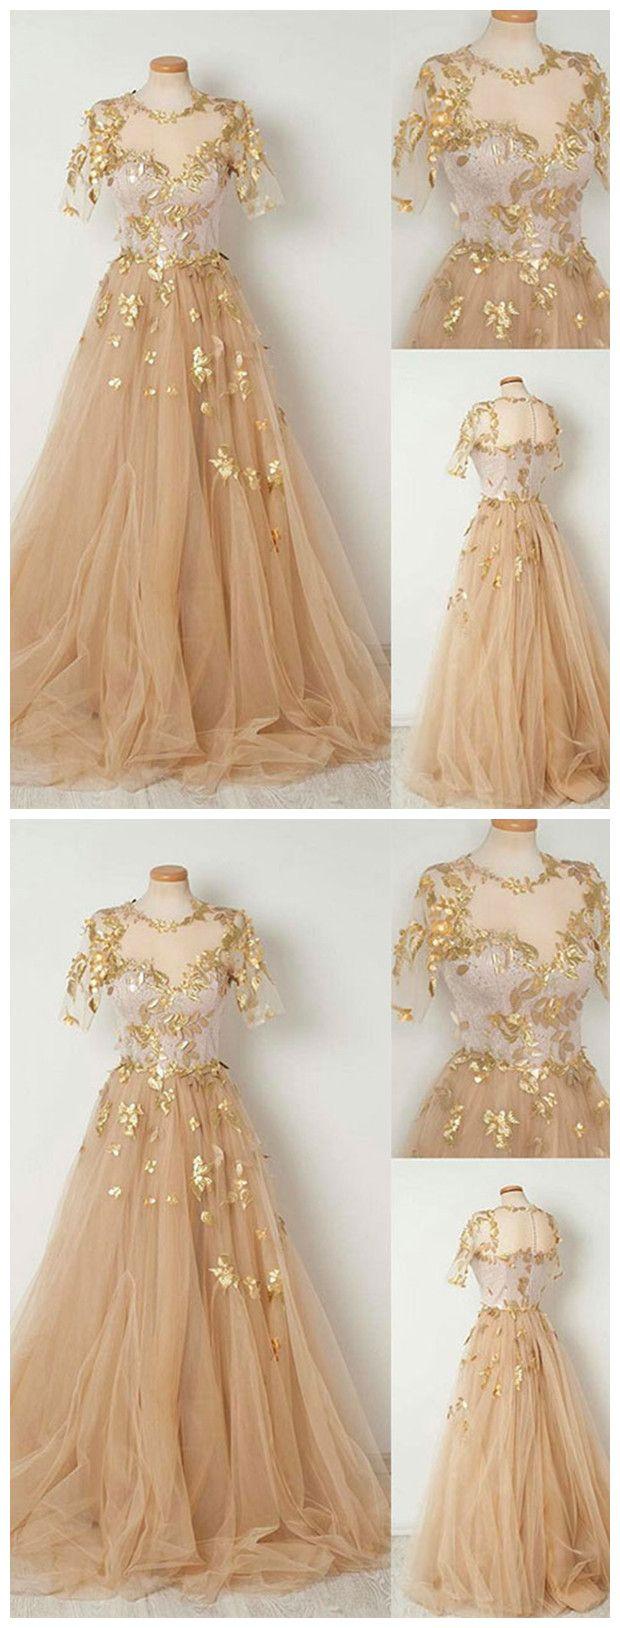 Sparkly prom dress aline scoop short sleeve gold long prom dresses